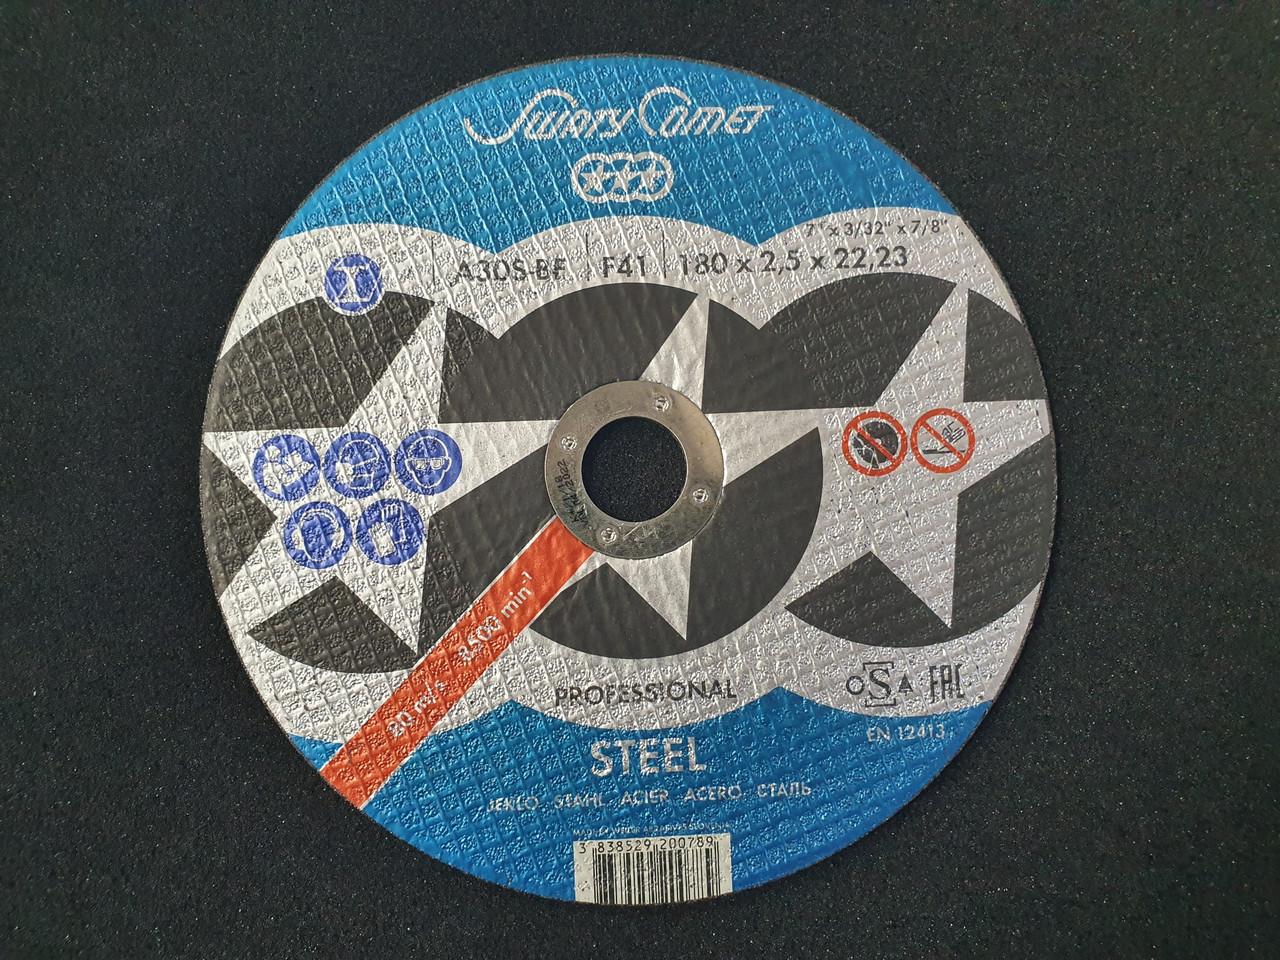 Круг отрезной Metal 180 х 2,5 х 22,23 SwatyComet A30S-BF (Weiler Abrasives, Slovenija)